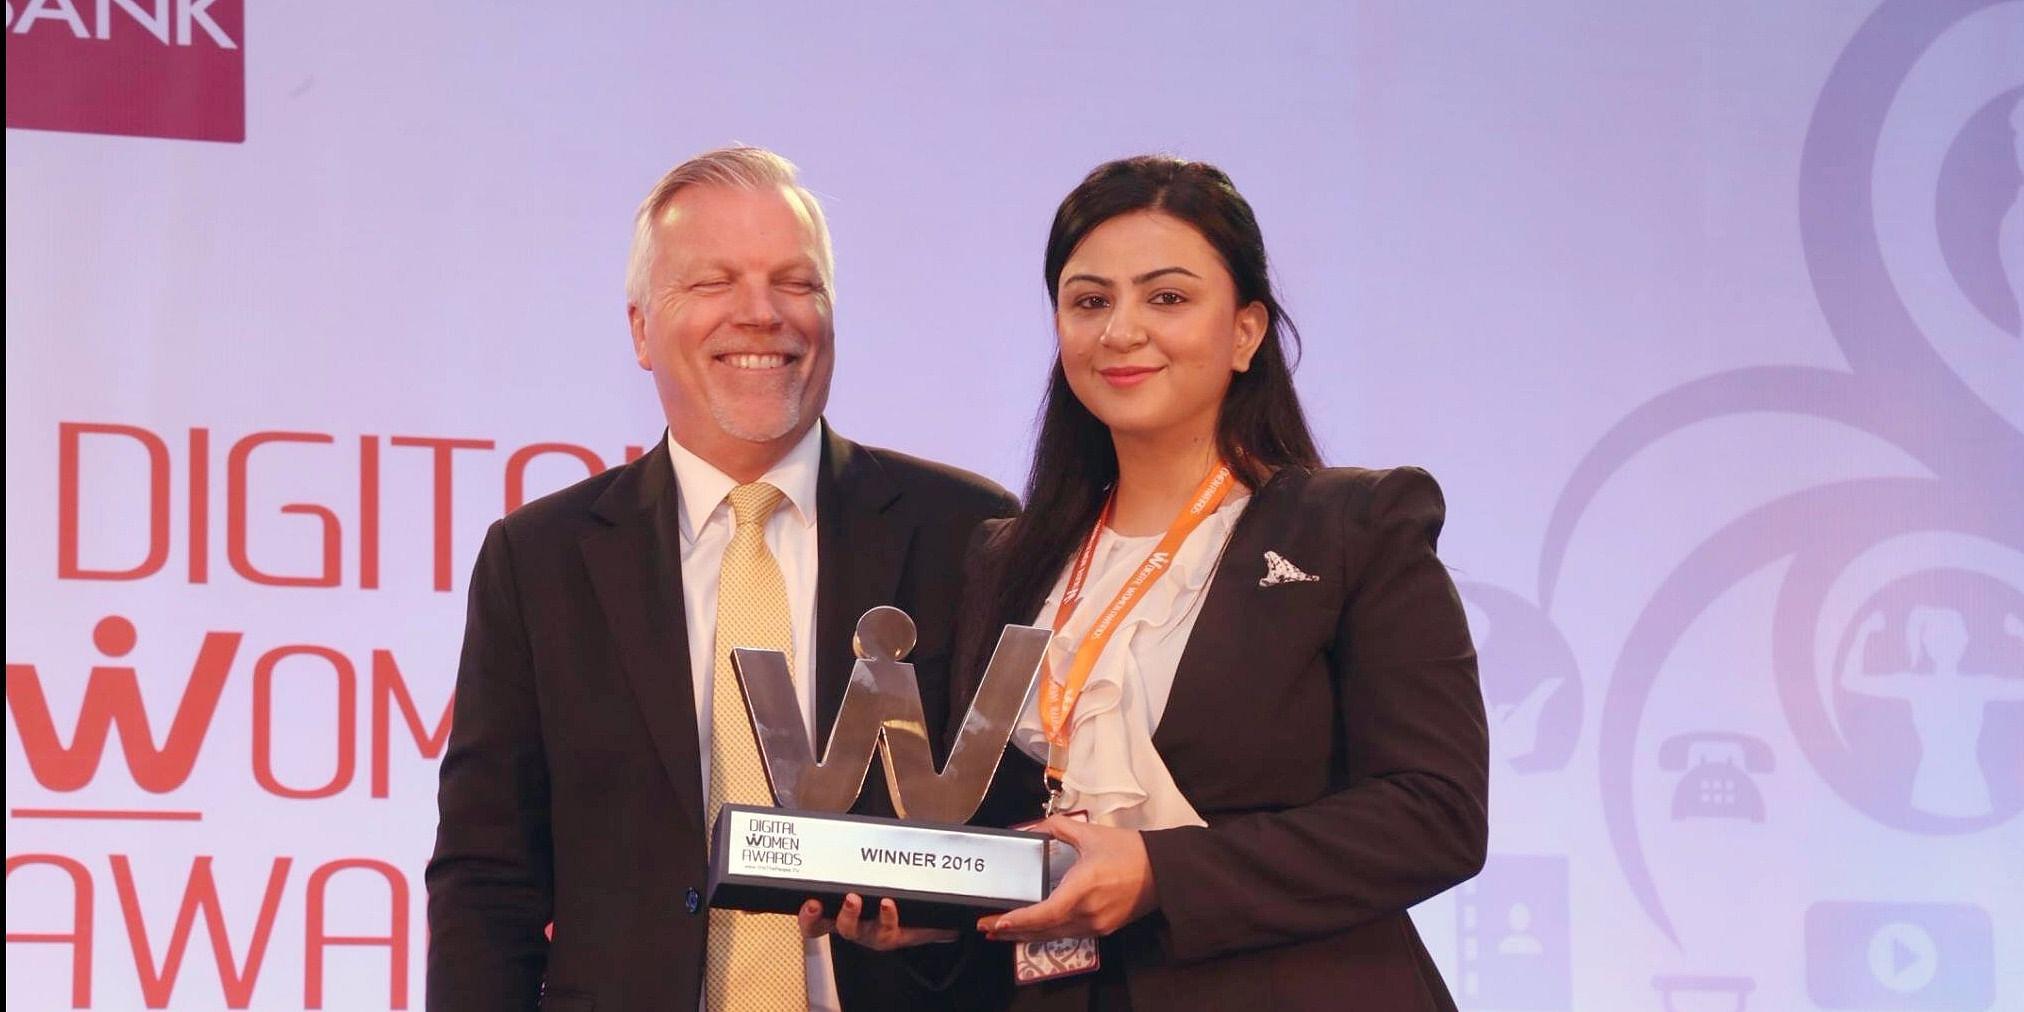 Mr. Wolfgang, Lufthansa India presenting an Award to Ms. Sakshi Talwar for Creative Disruptor, Rugs and Beyond